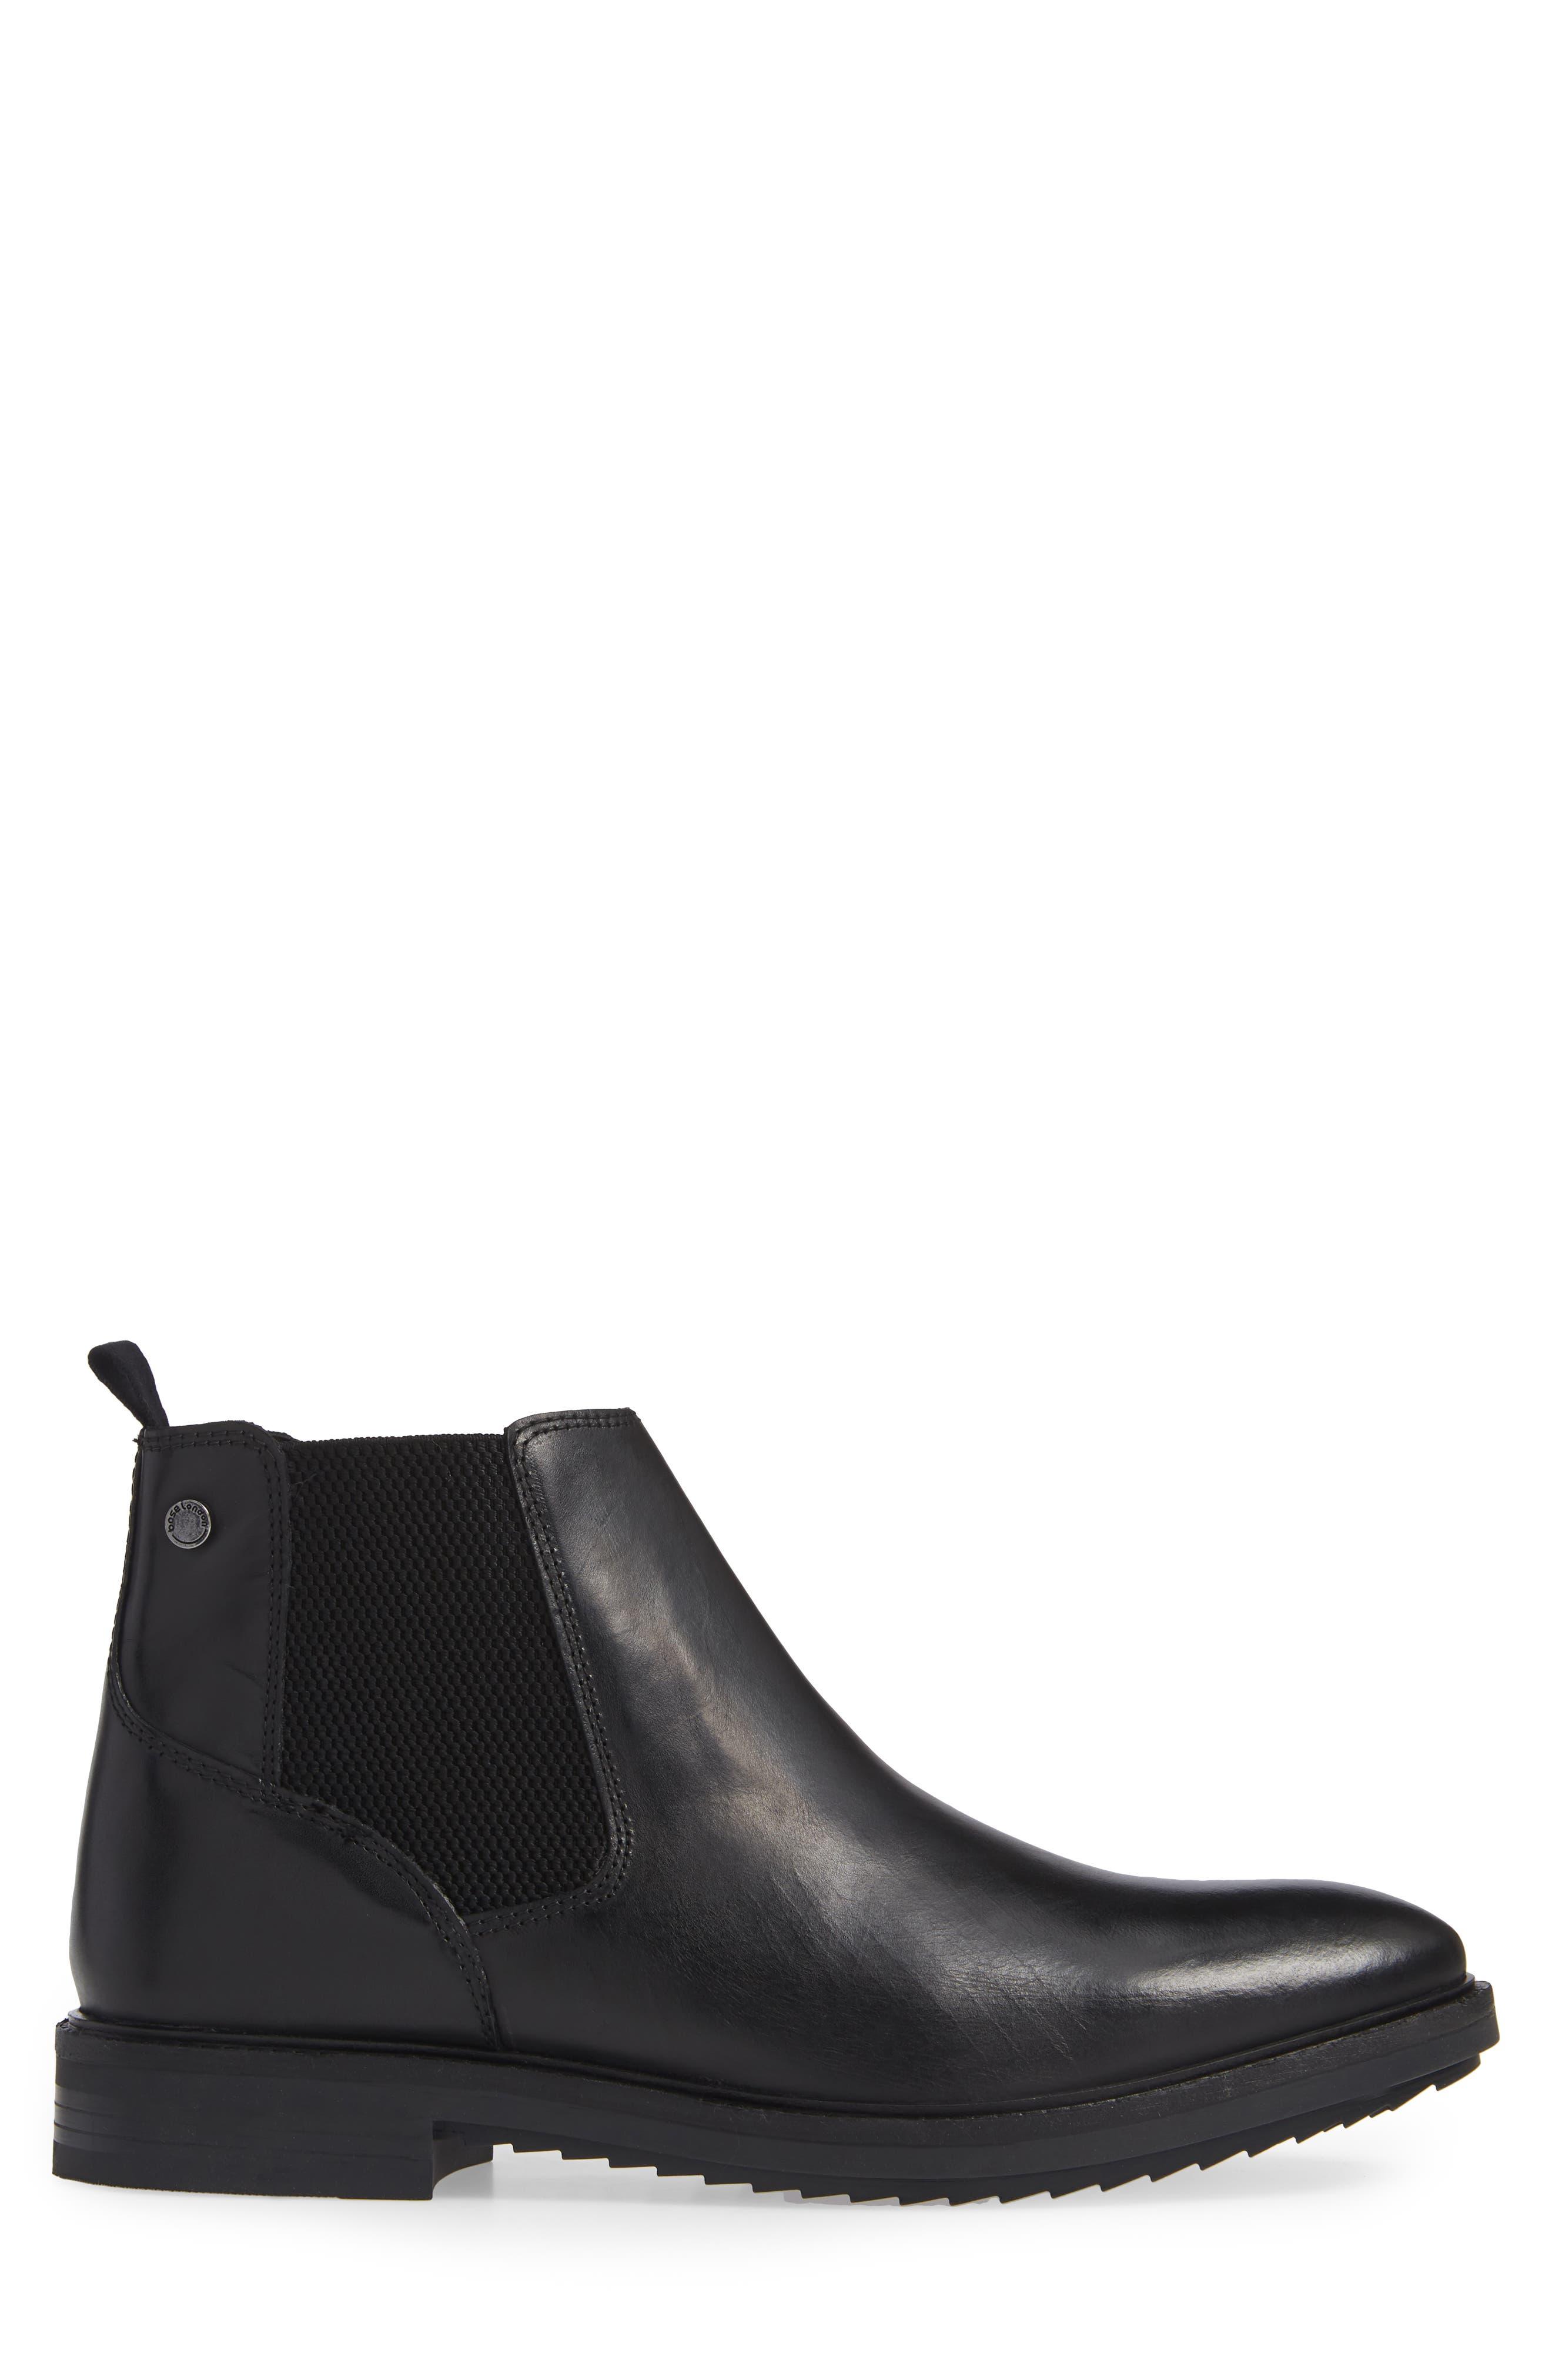 Kingsley Chelsea Boot,                             Alternate thumbnail 3, color,                             BLACK